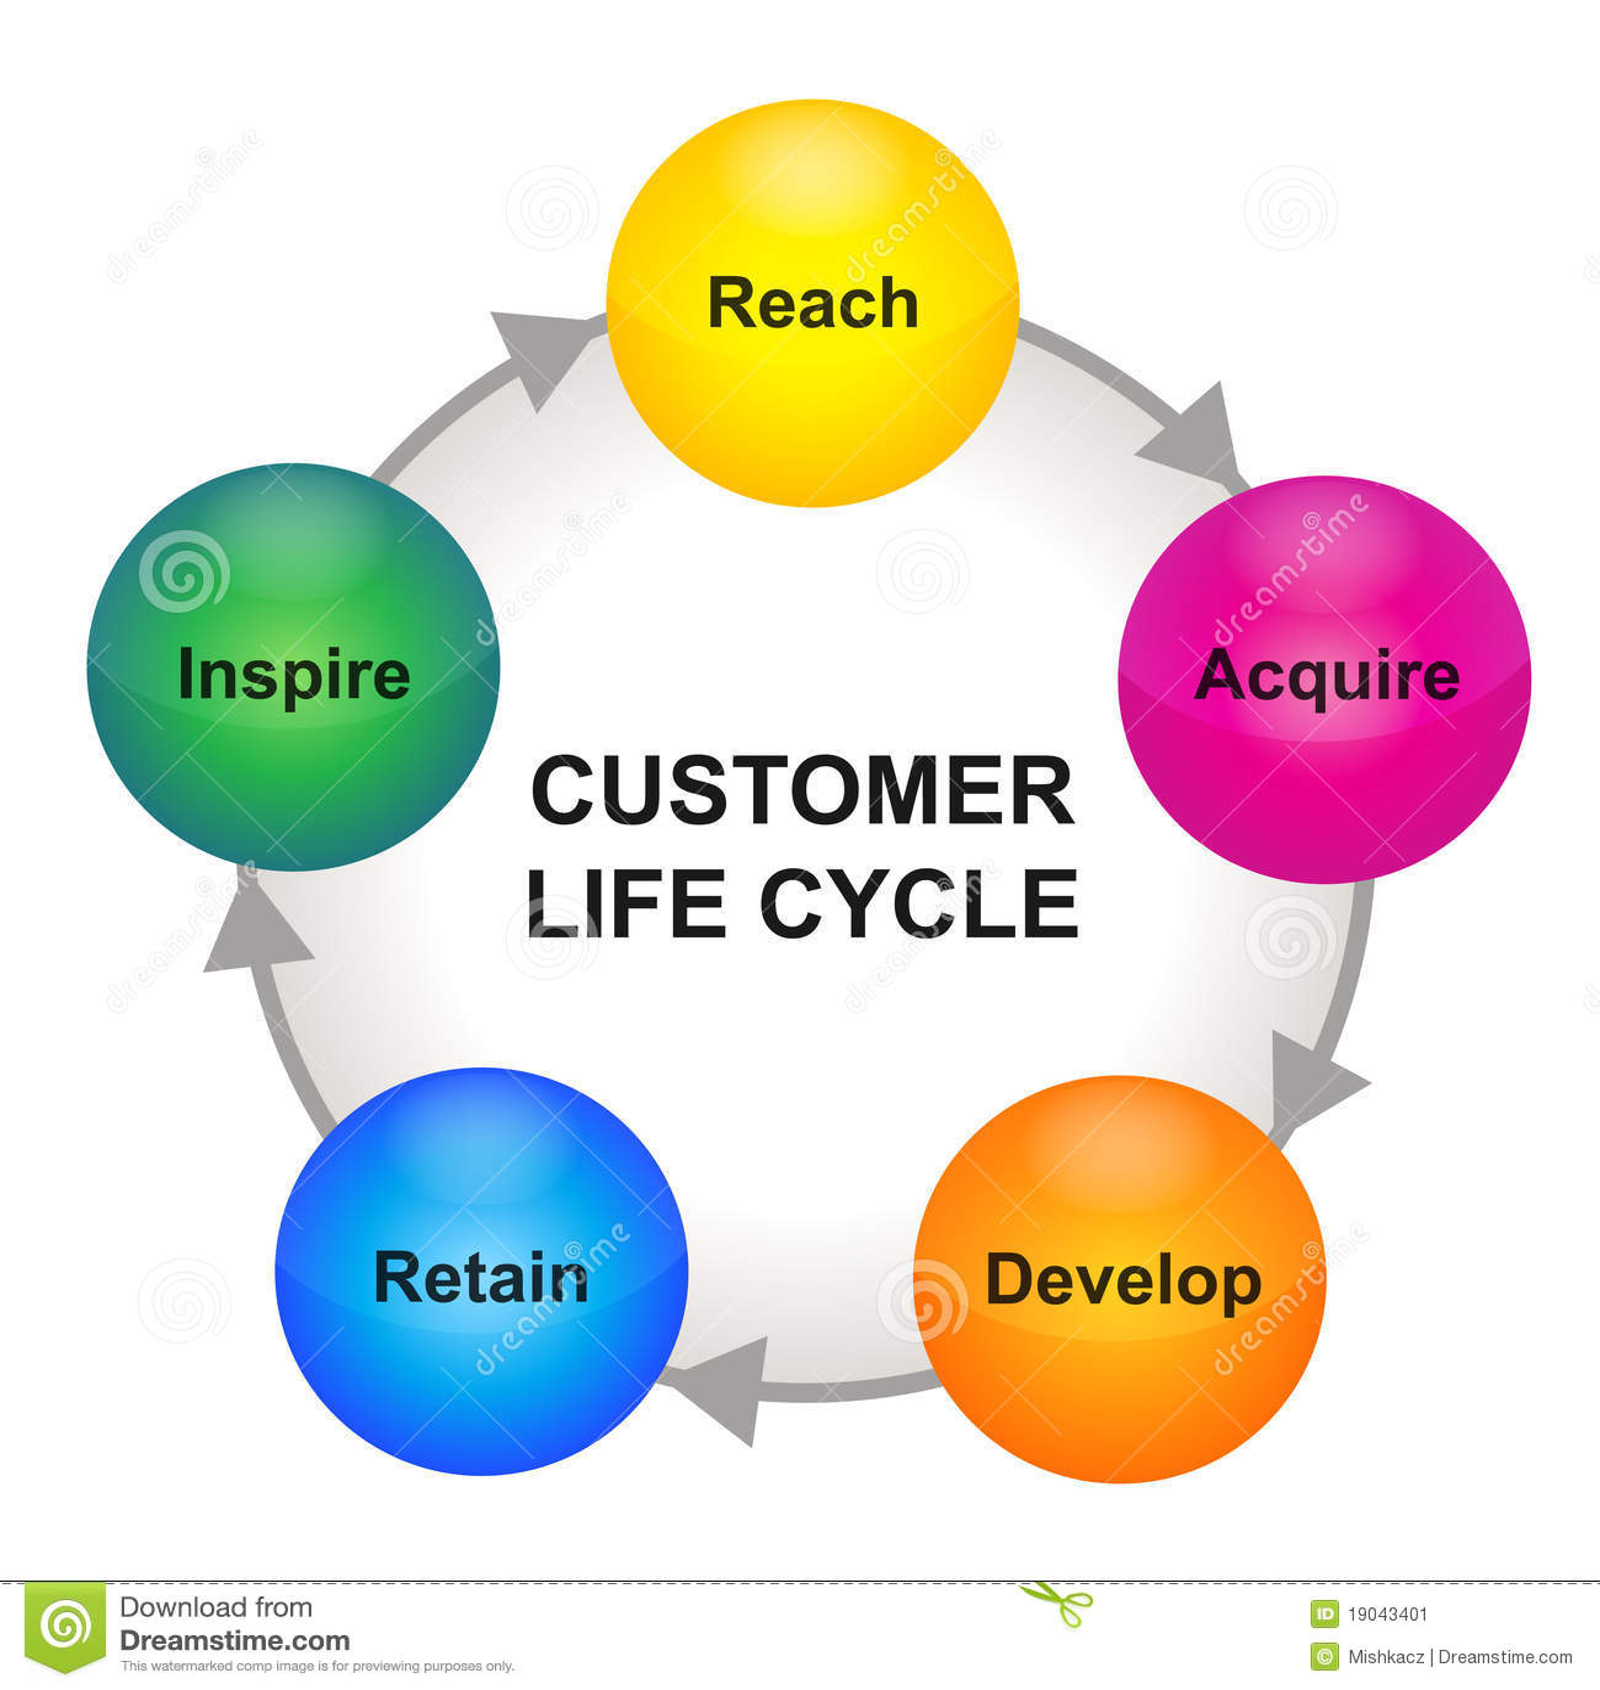 Customer life cycle model